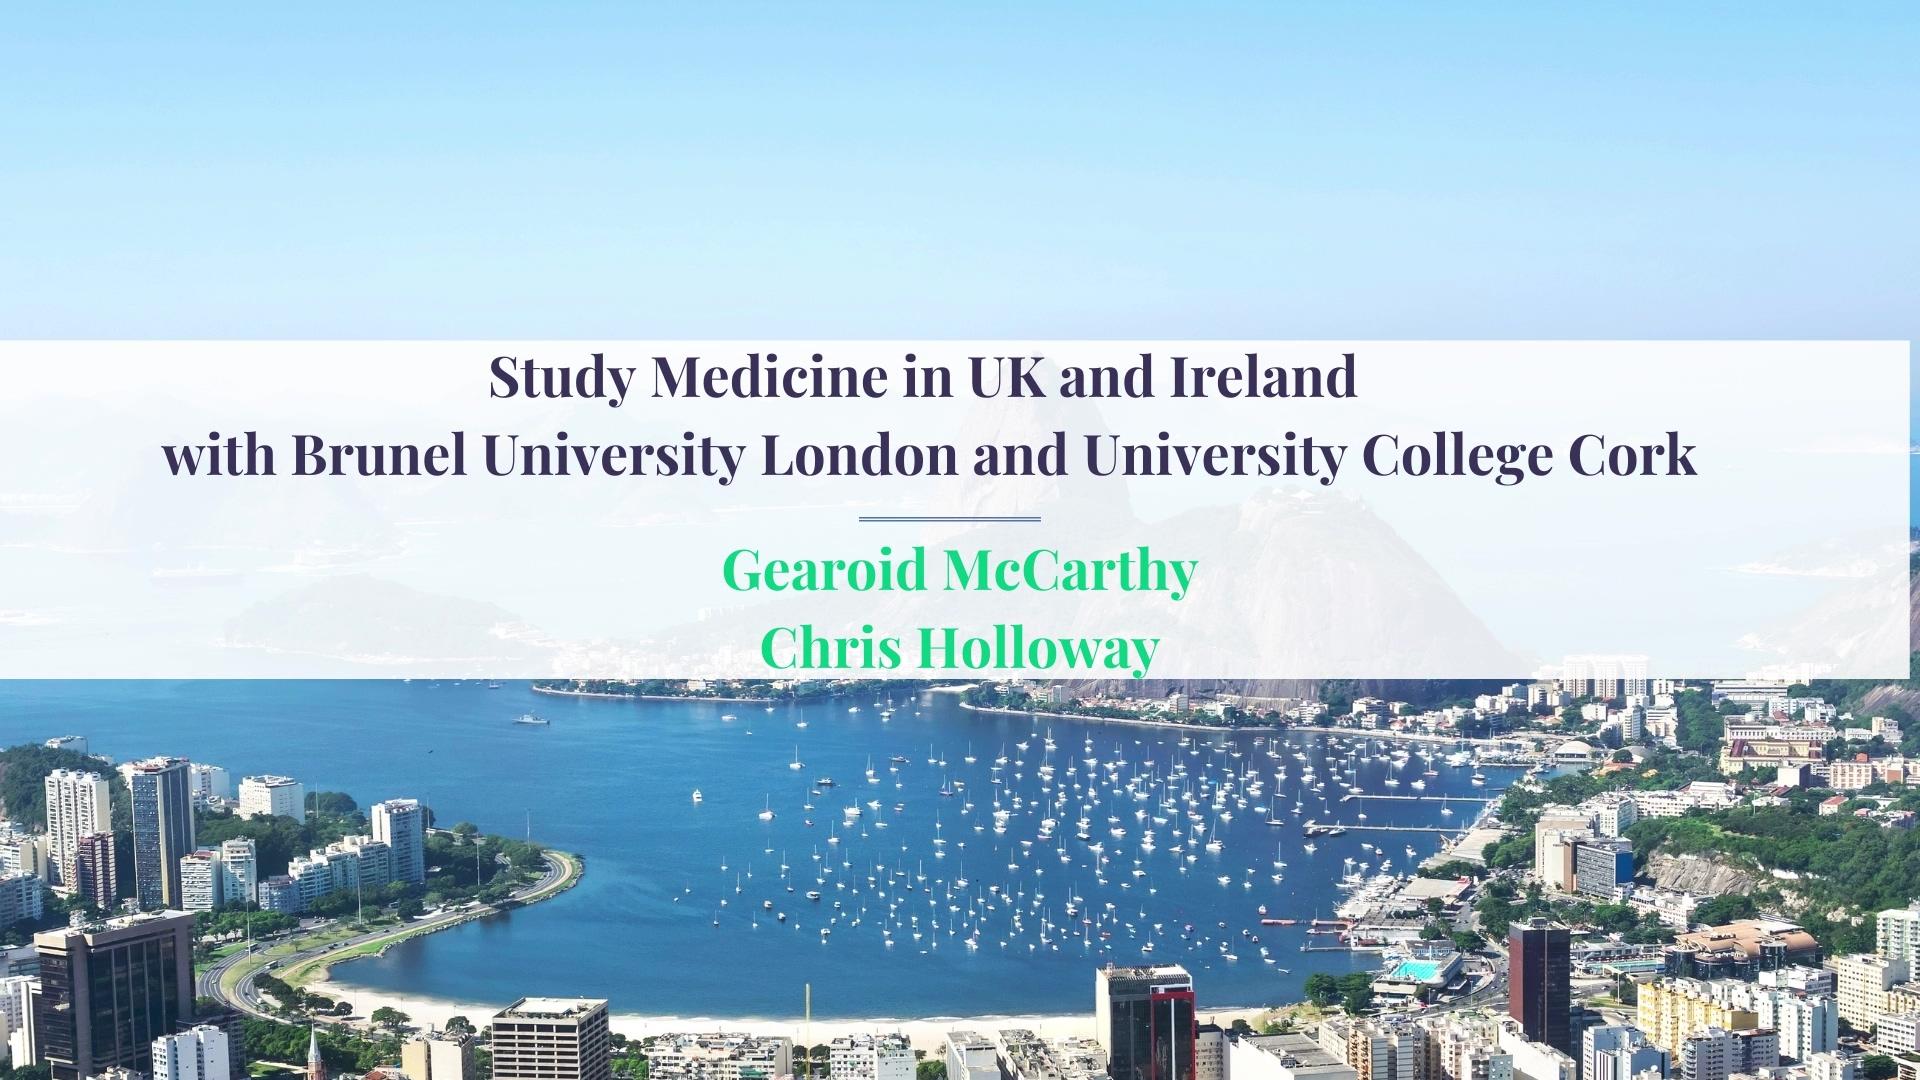 Study Medicine in UK and Ireland